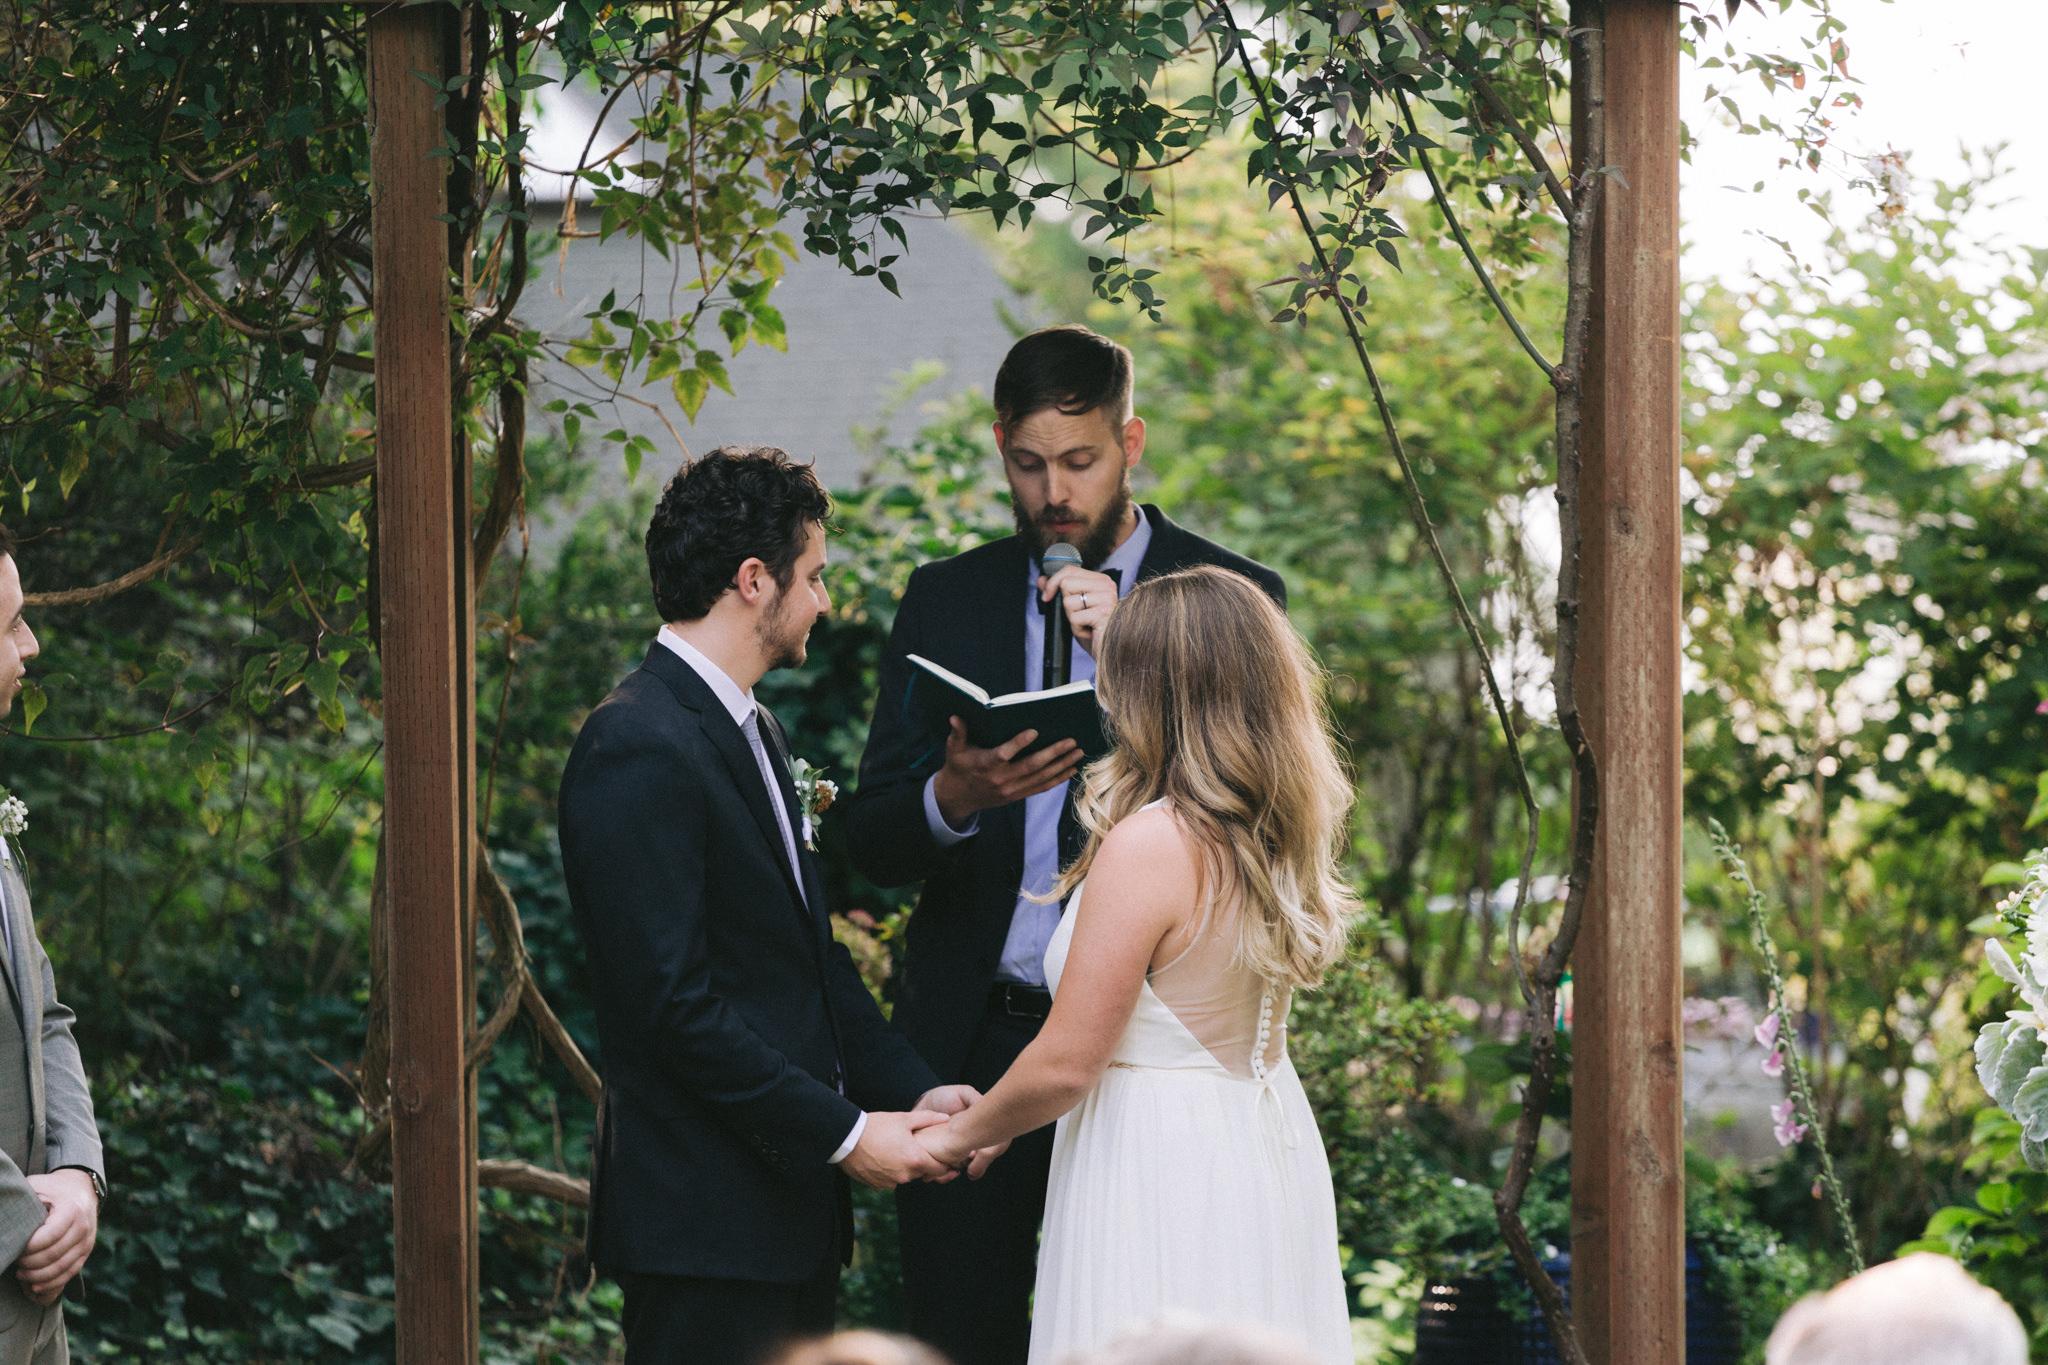 Backyard-Bainbridge-Island-Wedding-Alycia-Lovell-Photography-96.JPG